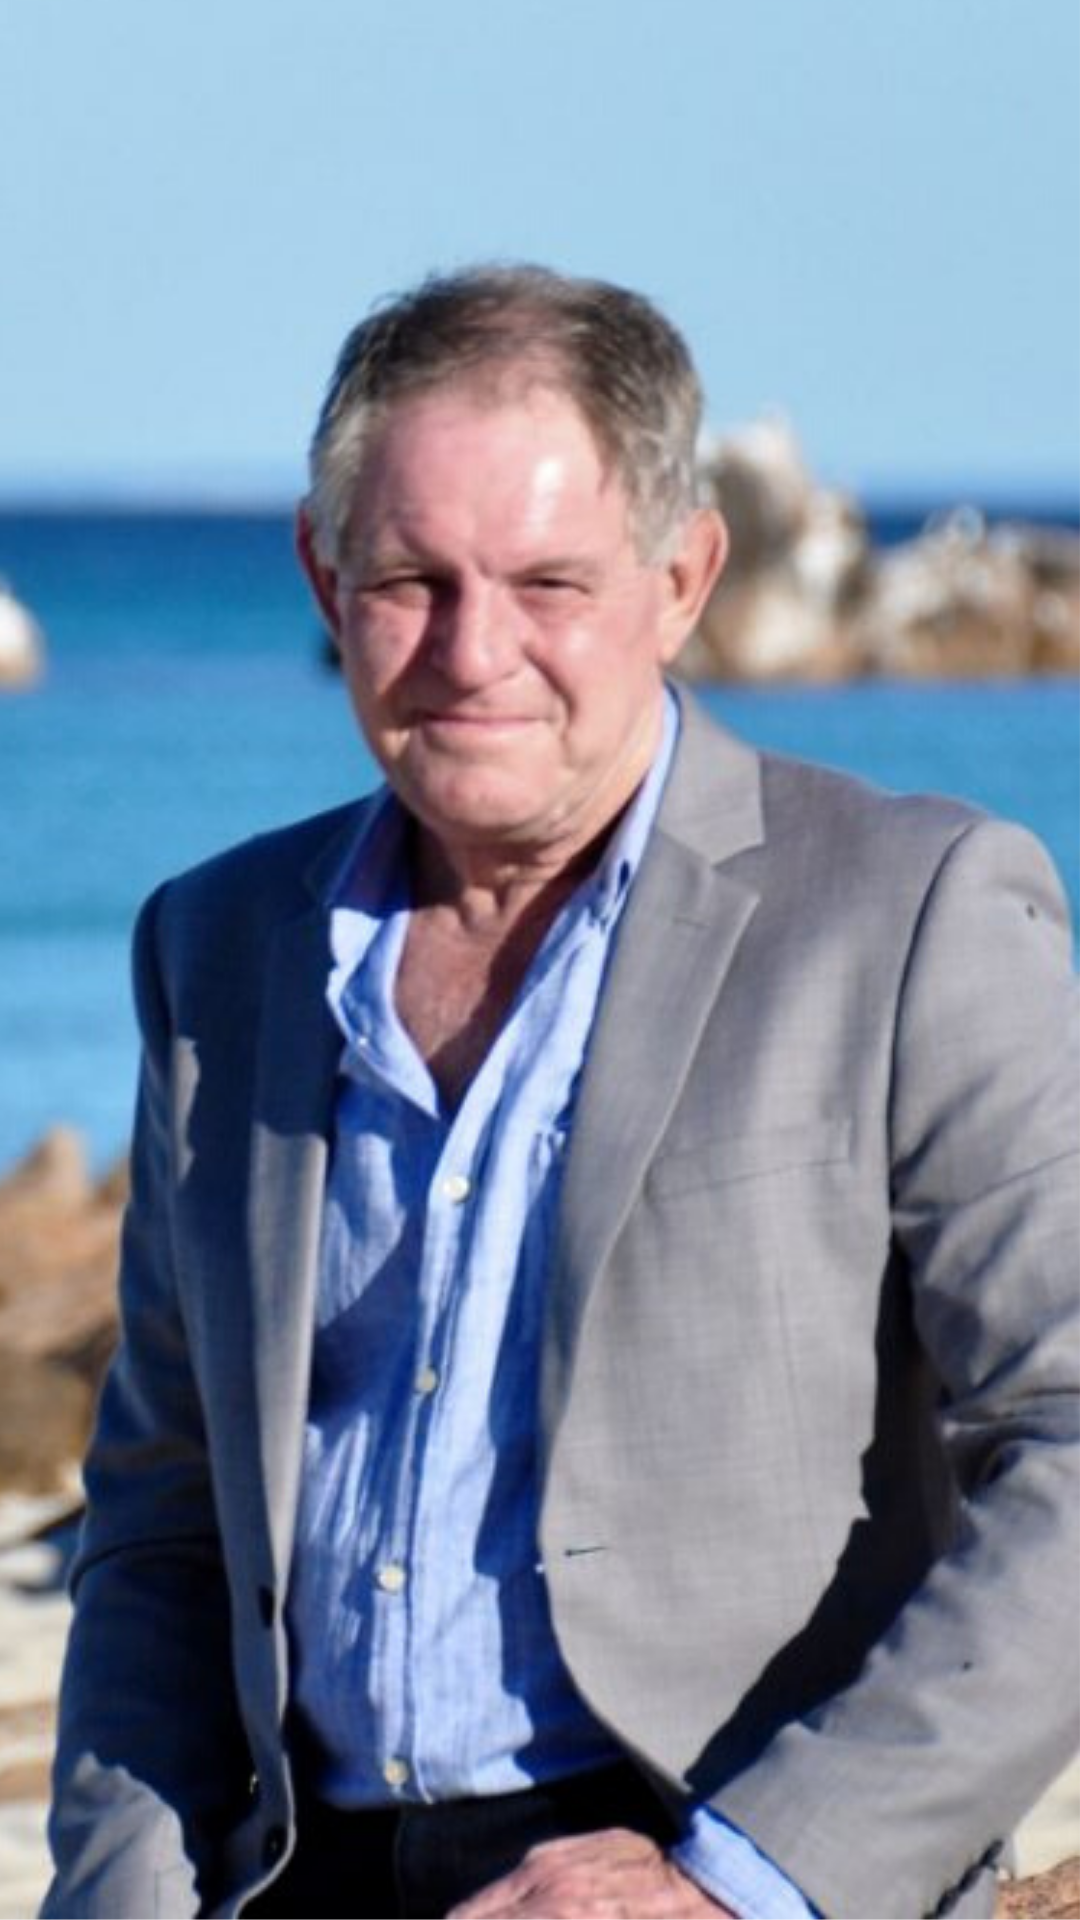 Greg Milner, Founder, Worldwide Salon Marketing